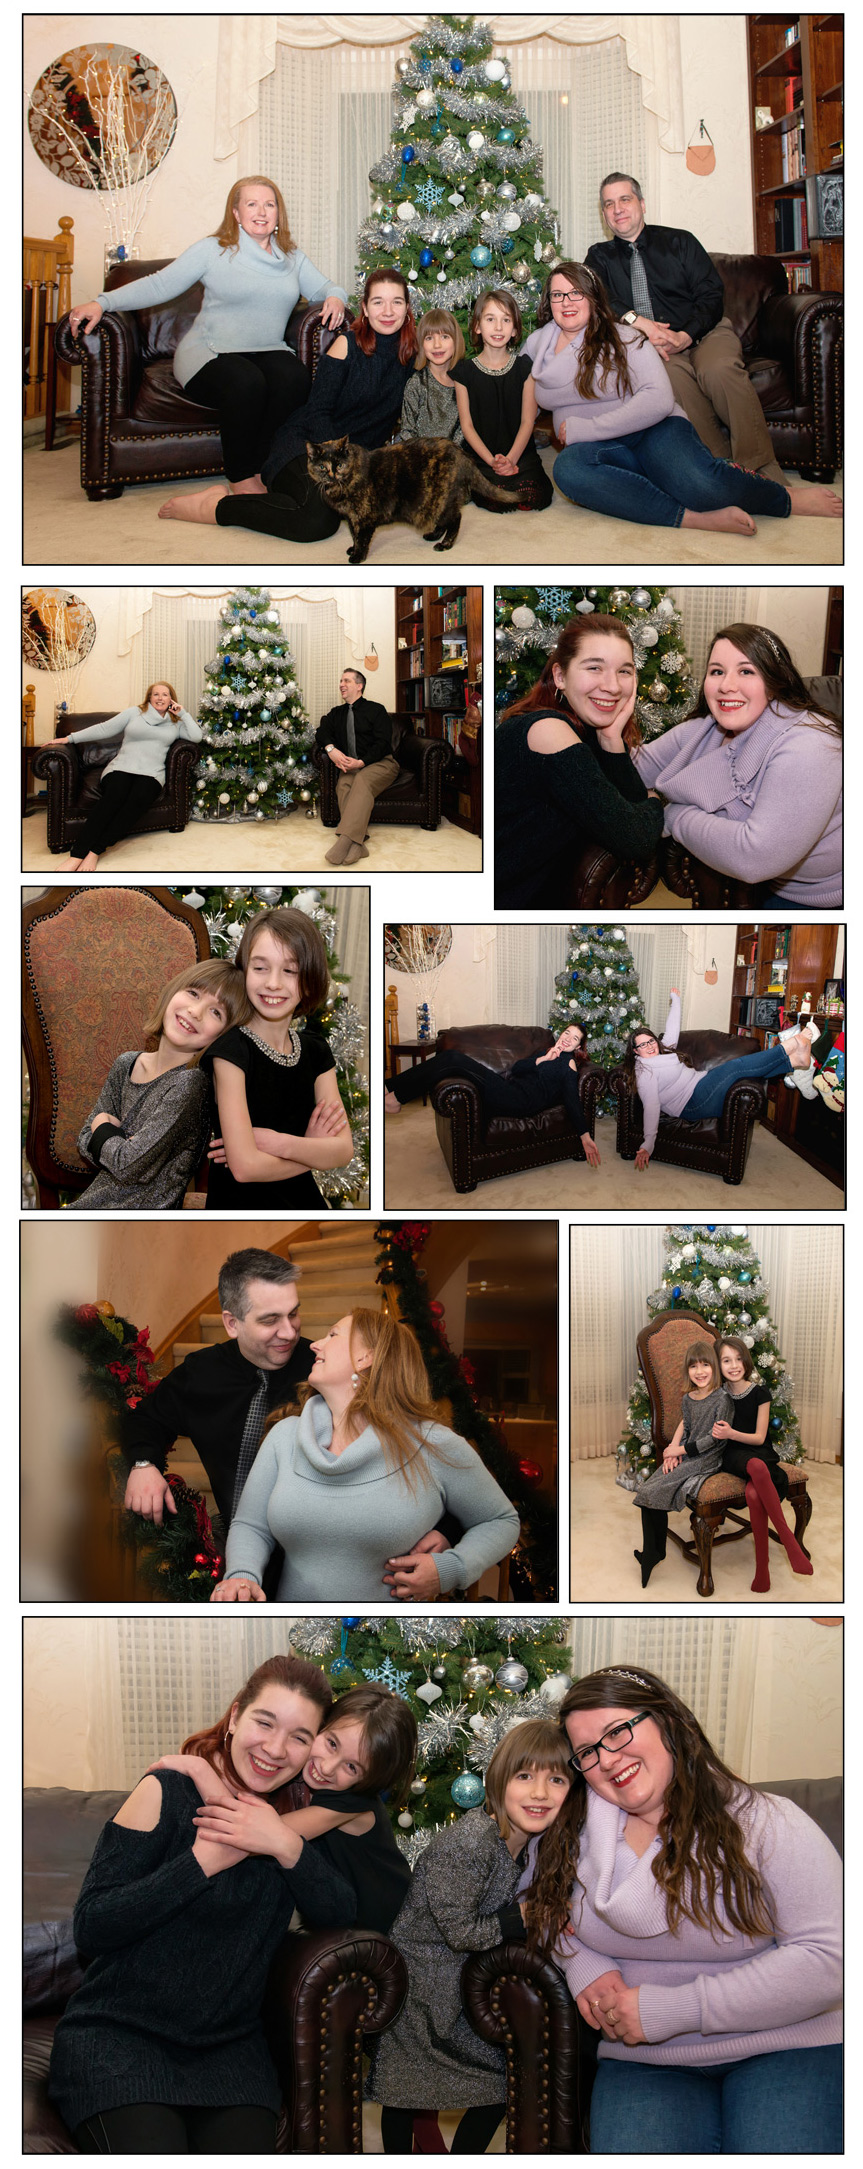 merry-christmas-free-lense-photo-02.jpg